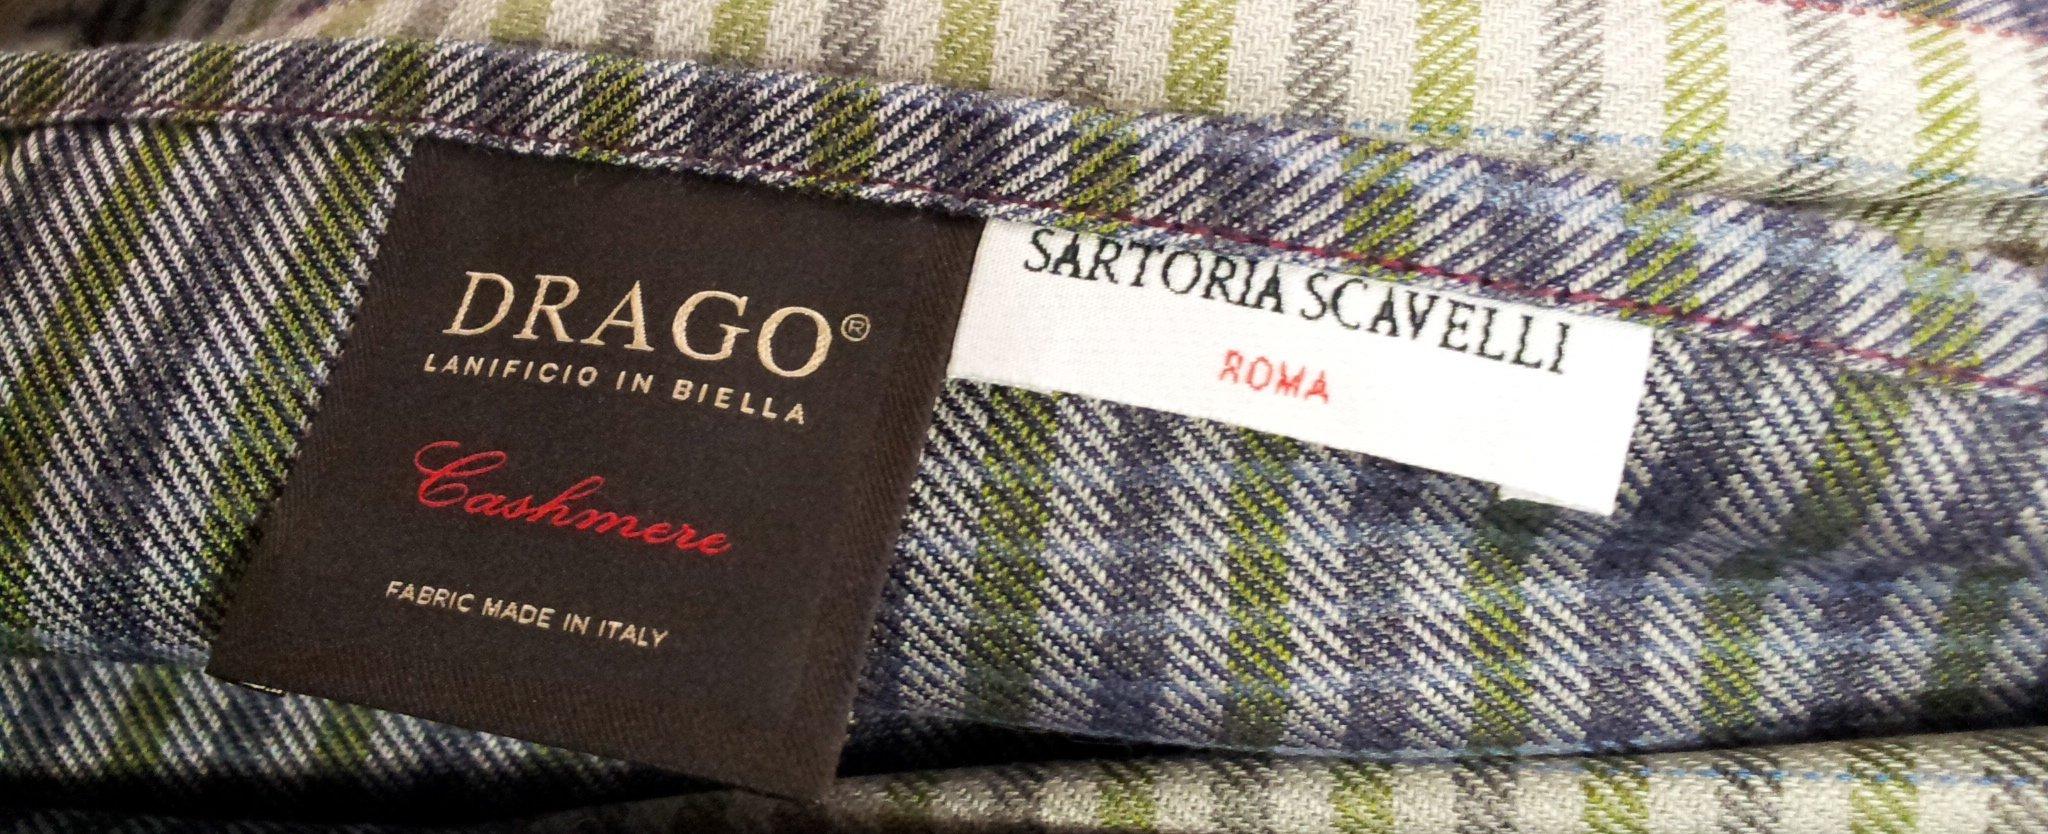 Sciarpe cashmere A/I 2013.